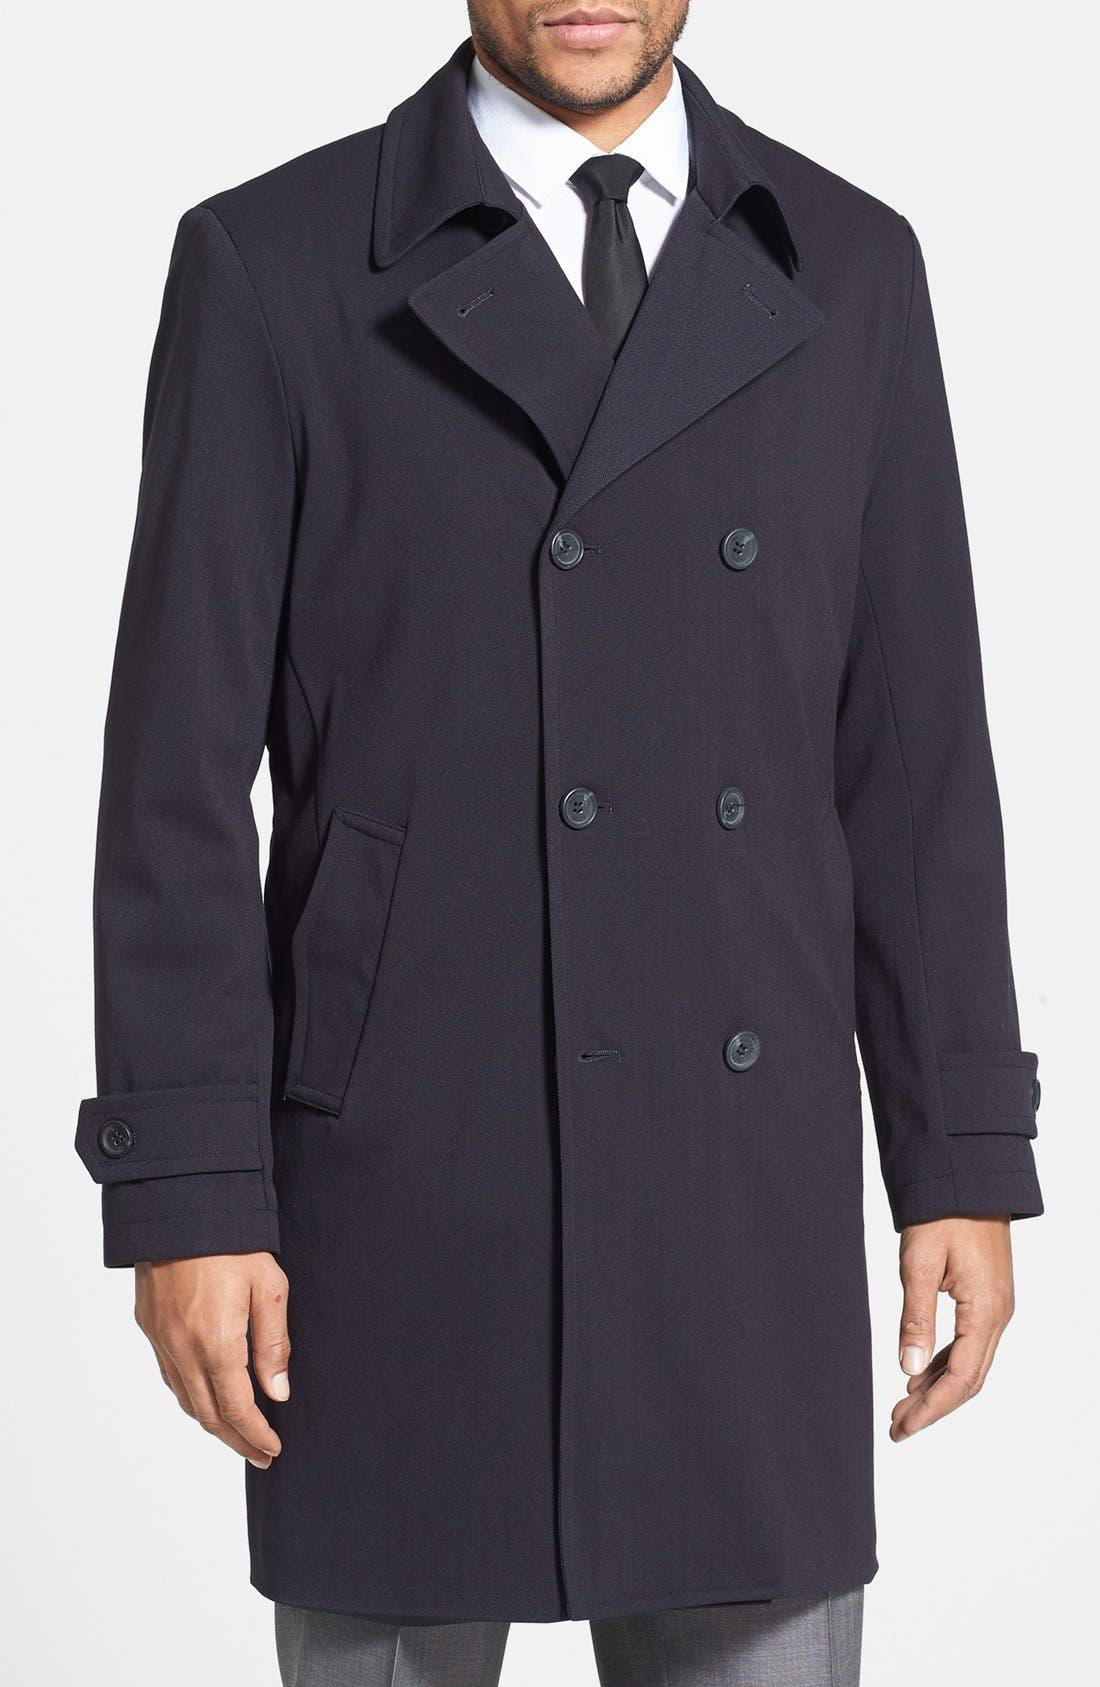 Alternate Image 1 Selected - Michael Kors 'Laz' Waterproof Double Breasted Topcoat